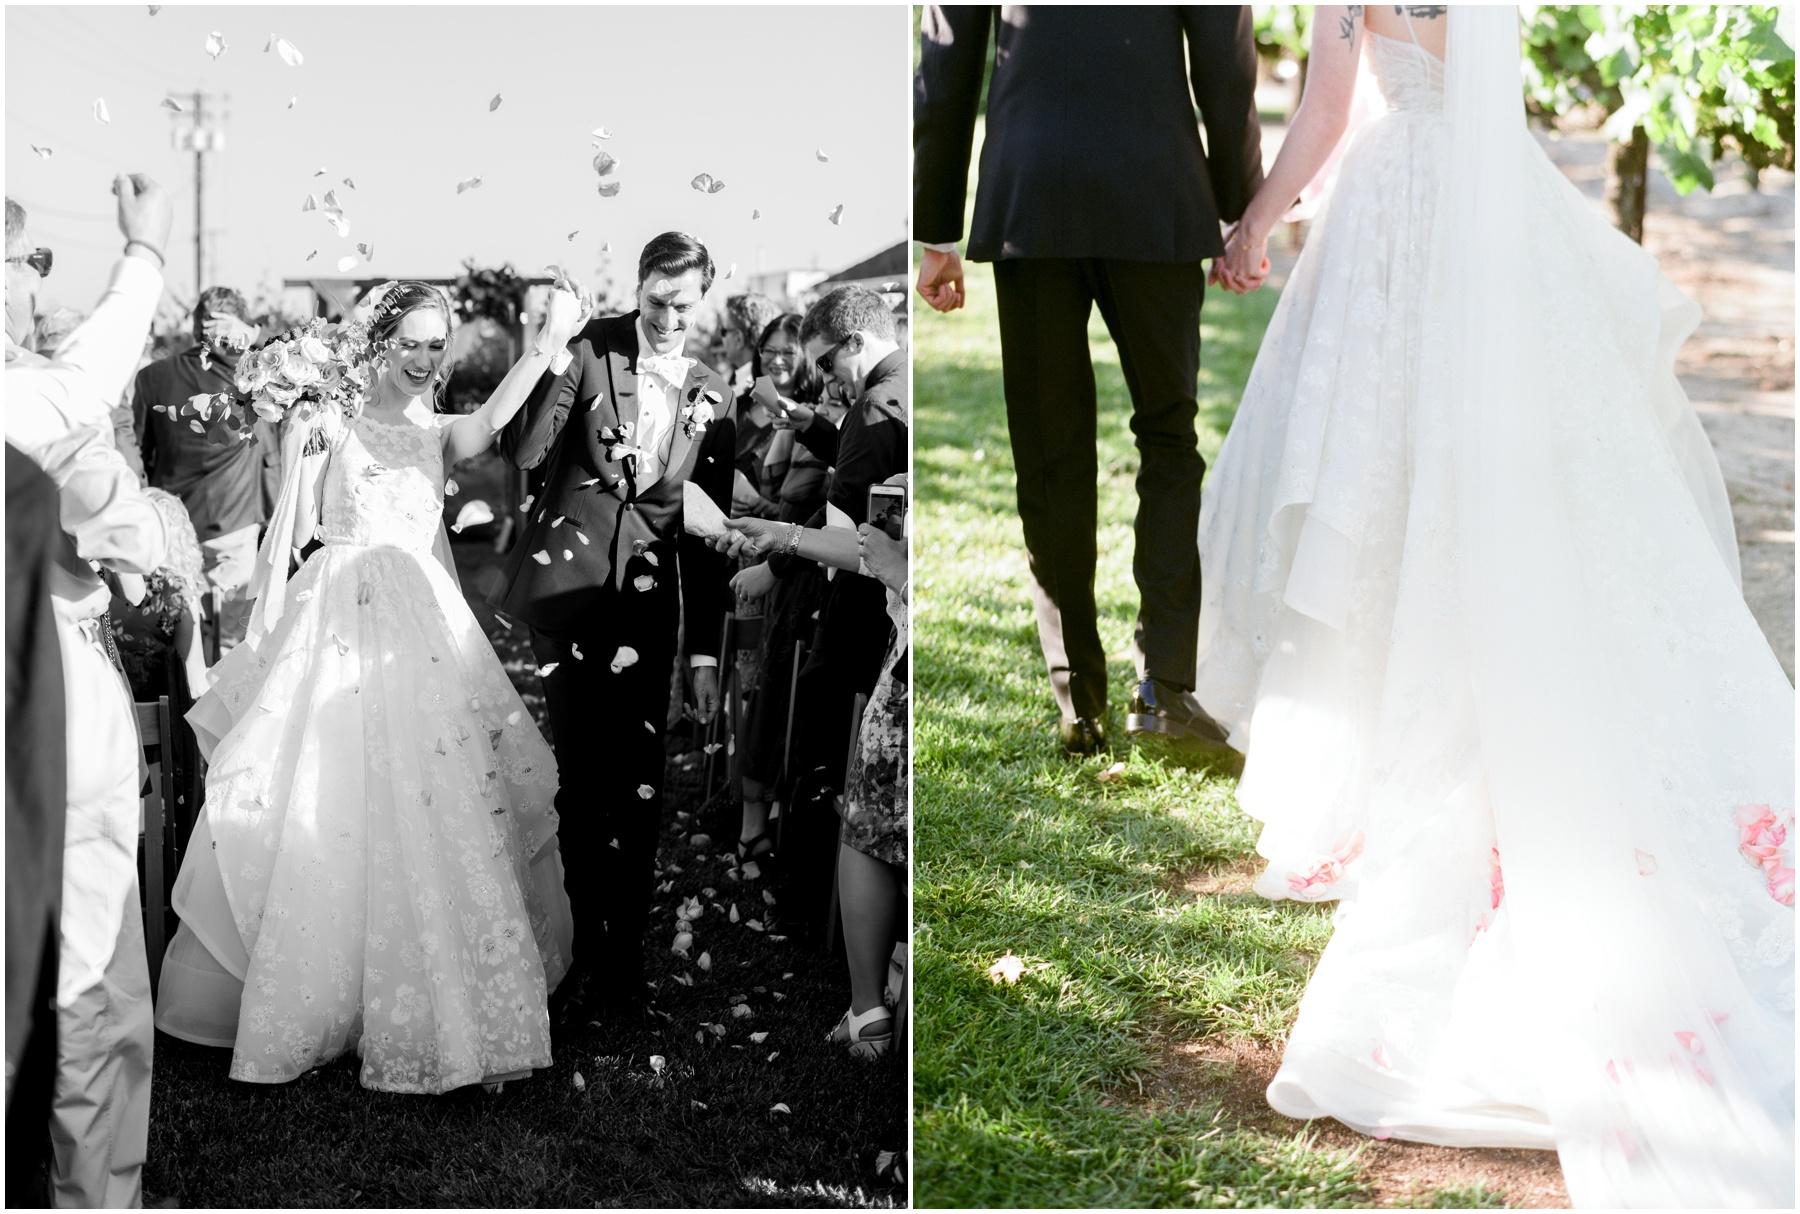 Scribner-bend-vineyards-wedding-sacramento-california-Kristine-Herman-Photography-233.jpg